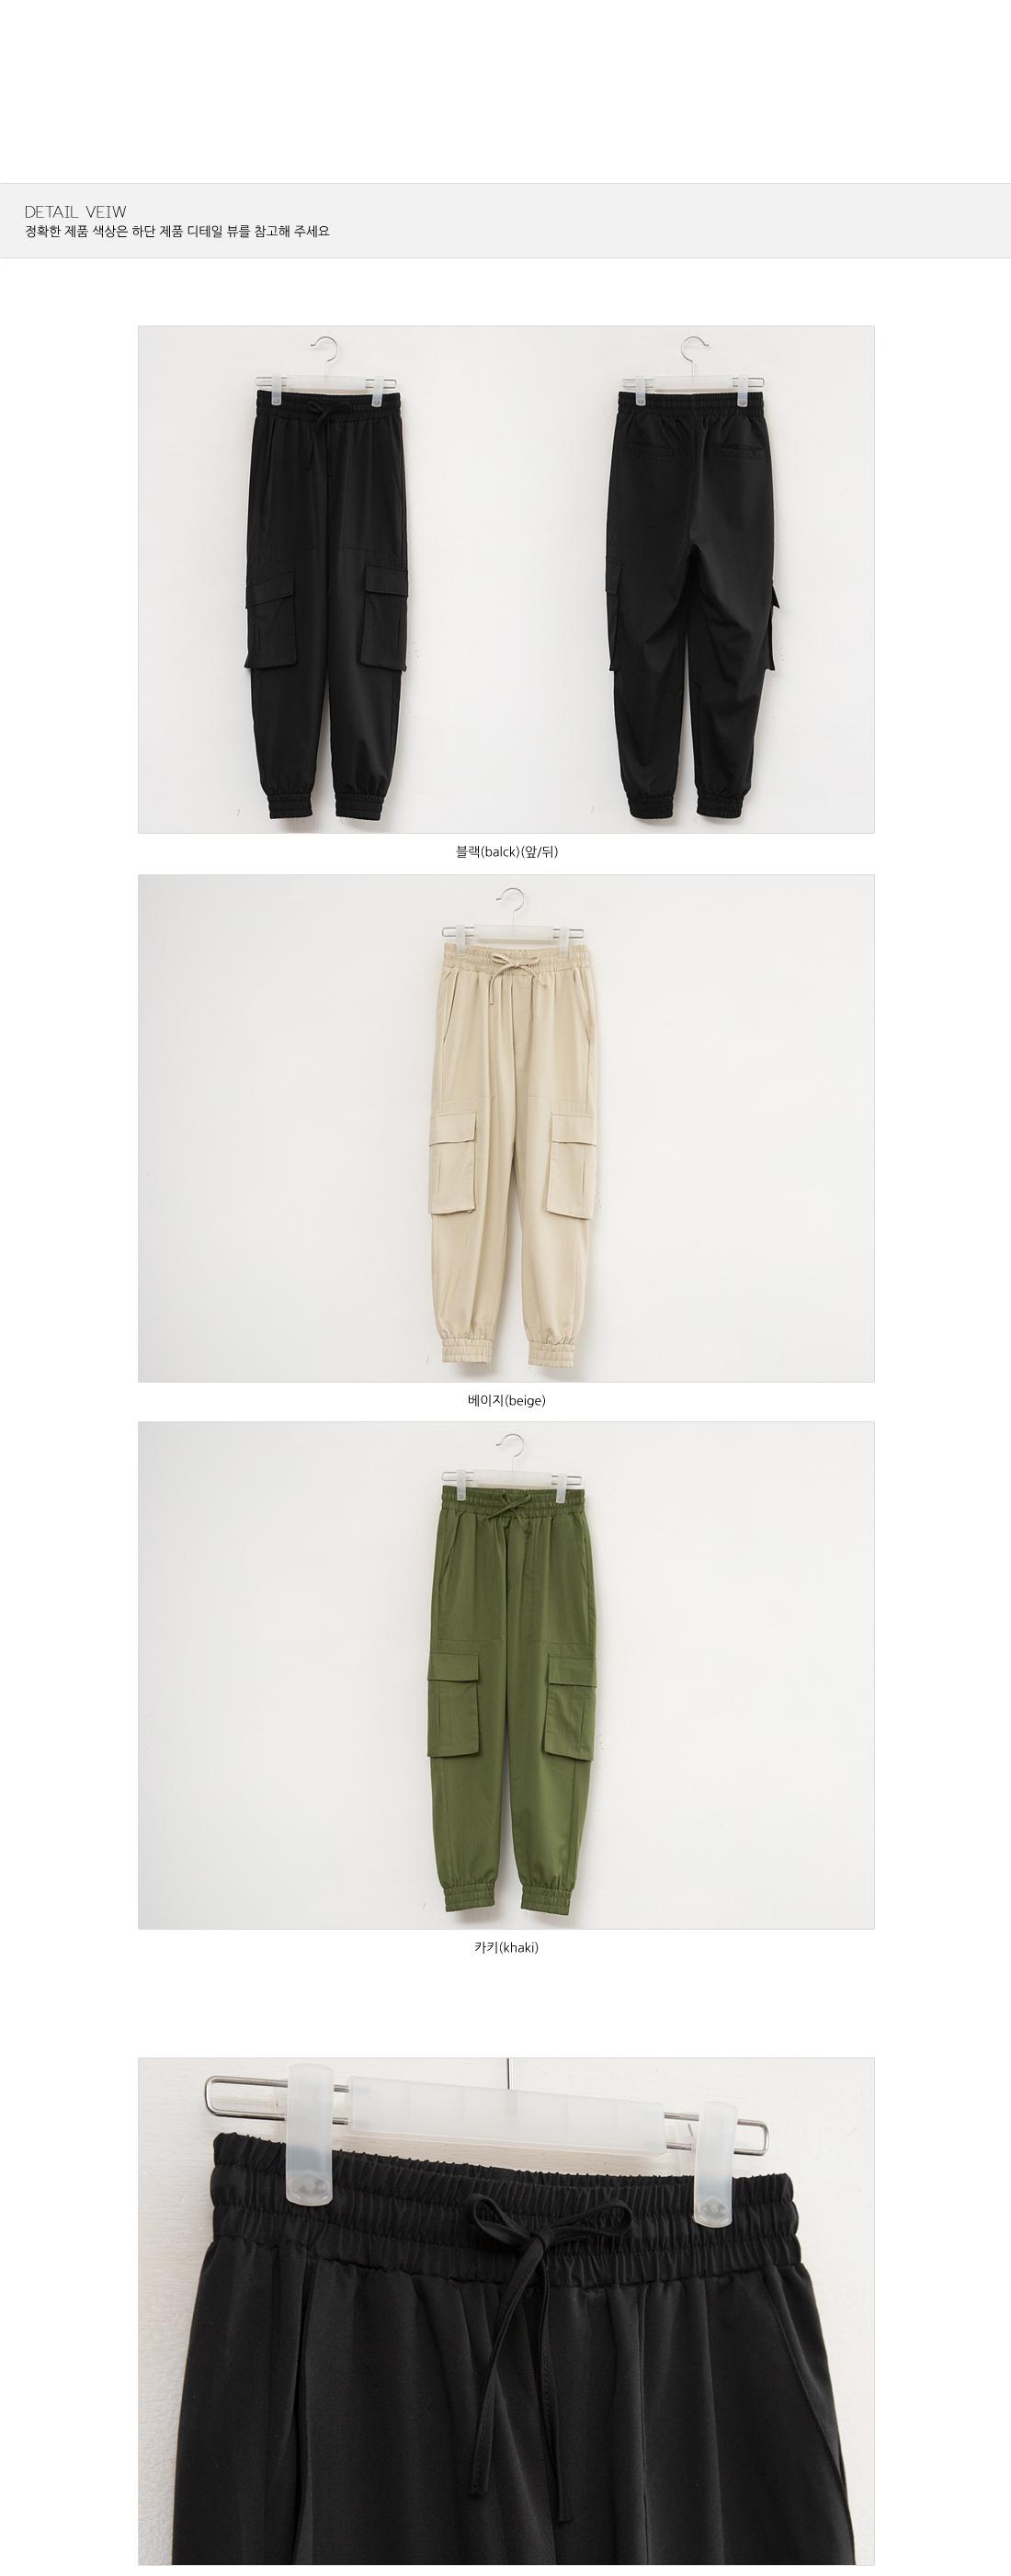 Pocket Jogger Banding Pants #75619